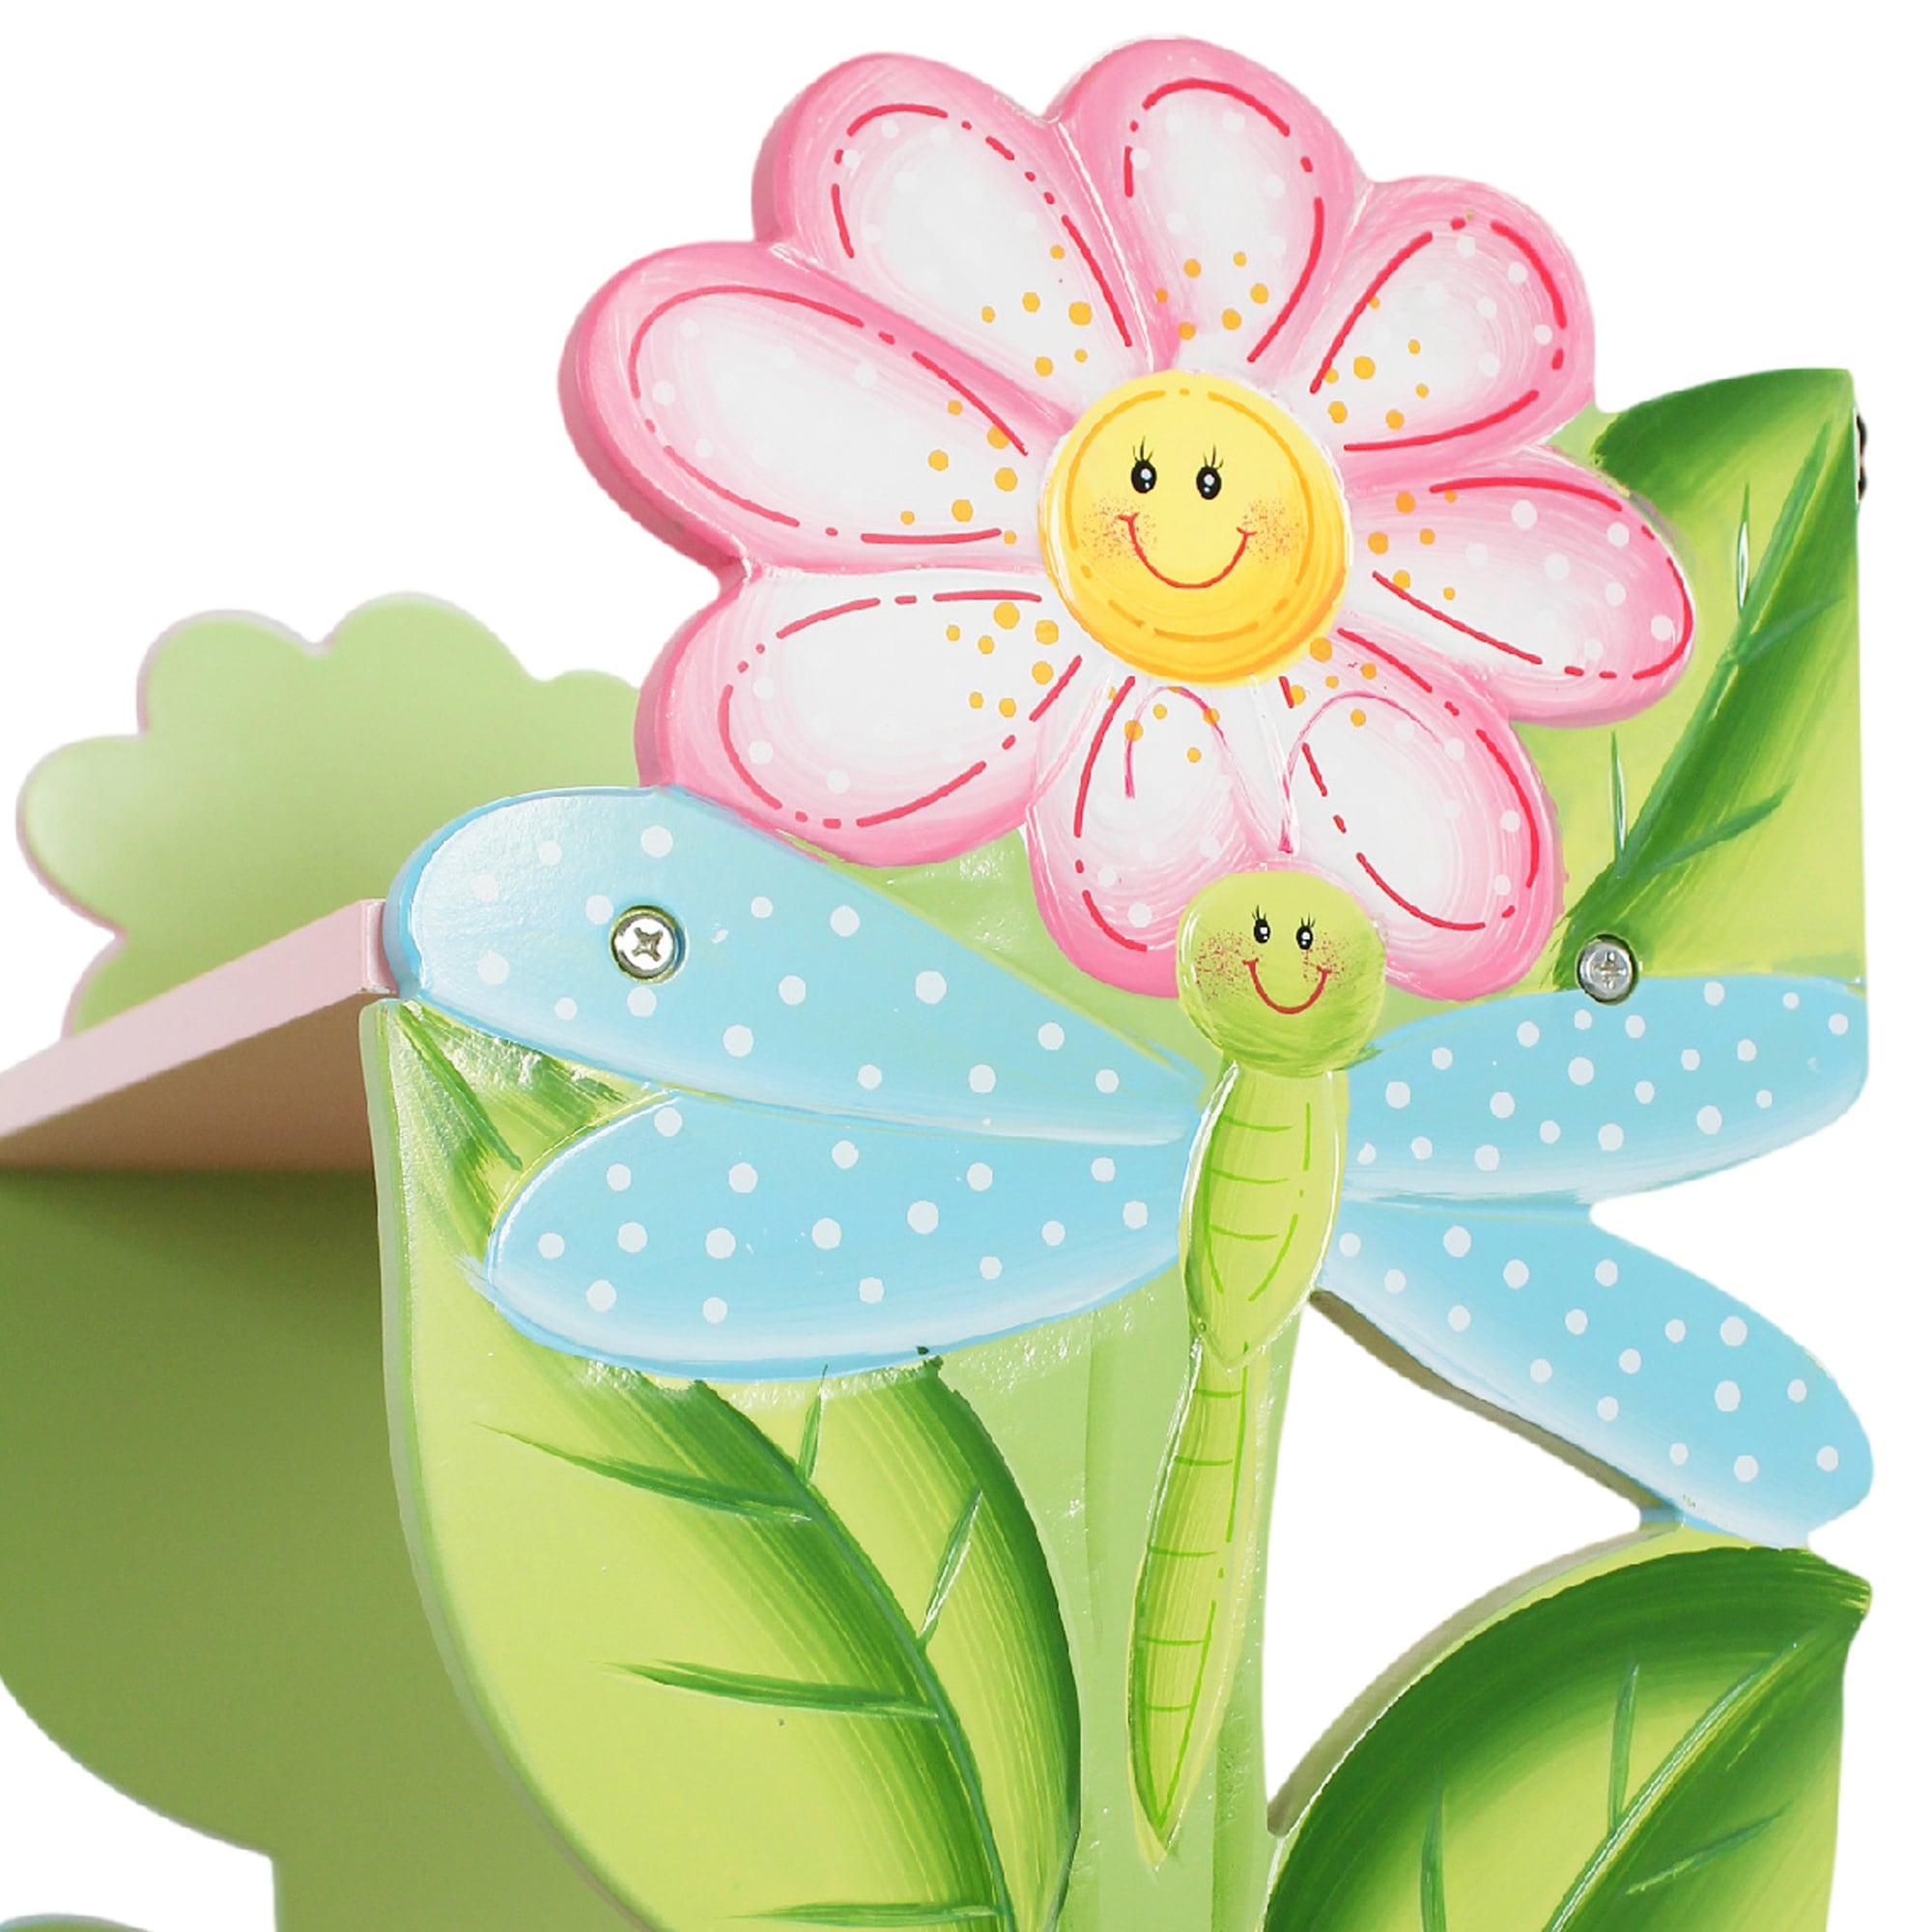 Attractive Fantasy Fields Magic Garden Bookshelf   Free Shipping Today   Overstock    17743740